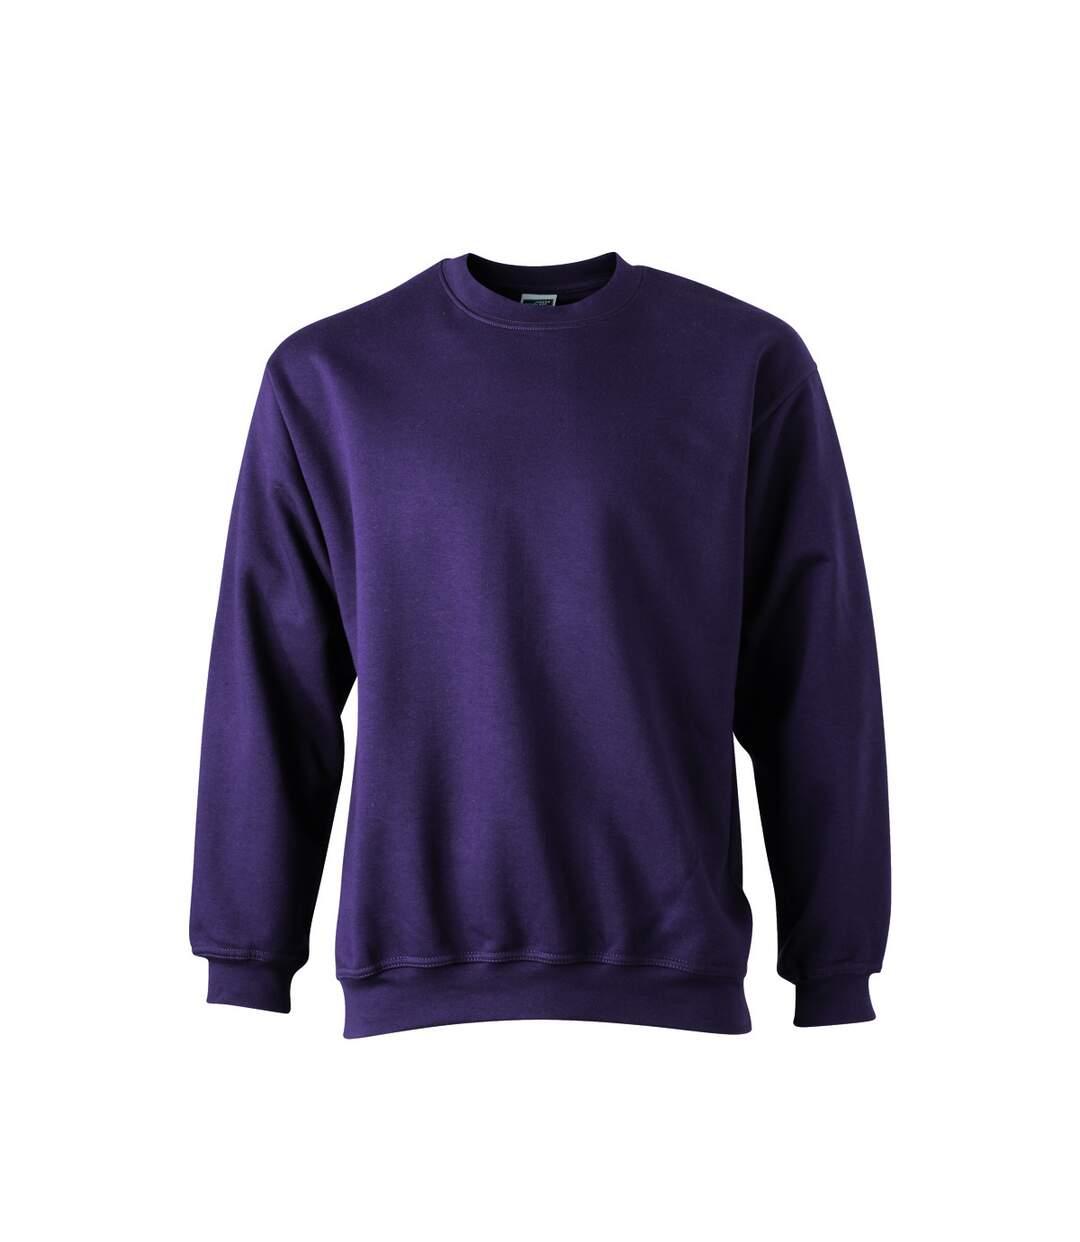 Sweat-shirt col rond - JN040 - violet aubergine - mixte homme femme